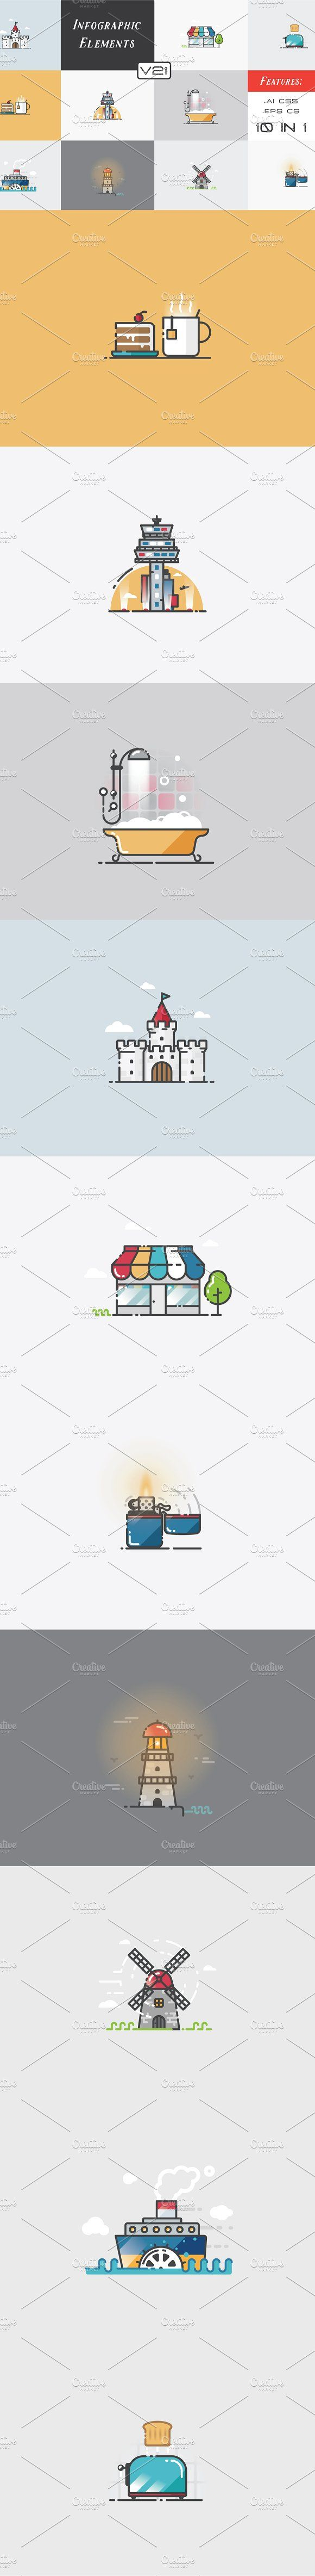 @newkoko2020 Infographic Elements (v21) by Infographic Paradise on @creativemarket #infographic #infographics #bundle #design #template #megabundle #bigbundle #presentation #vector #business #layout #creative #graph #information #visualization